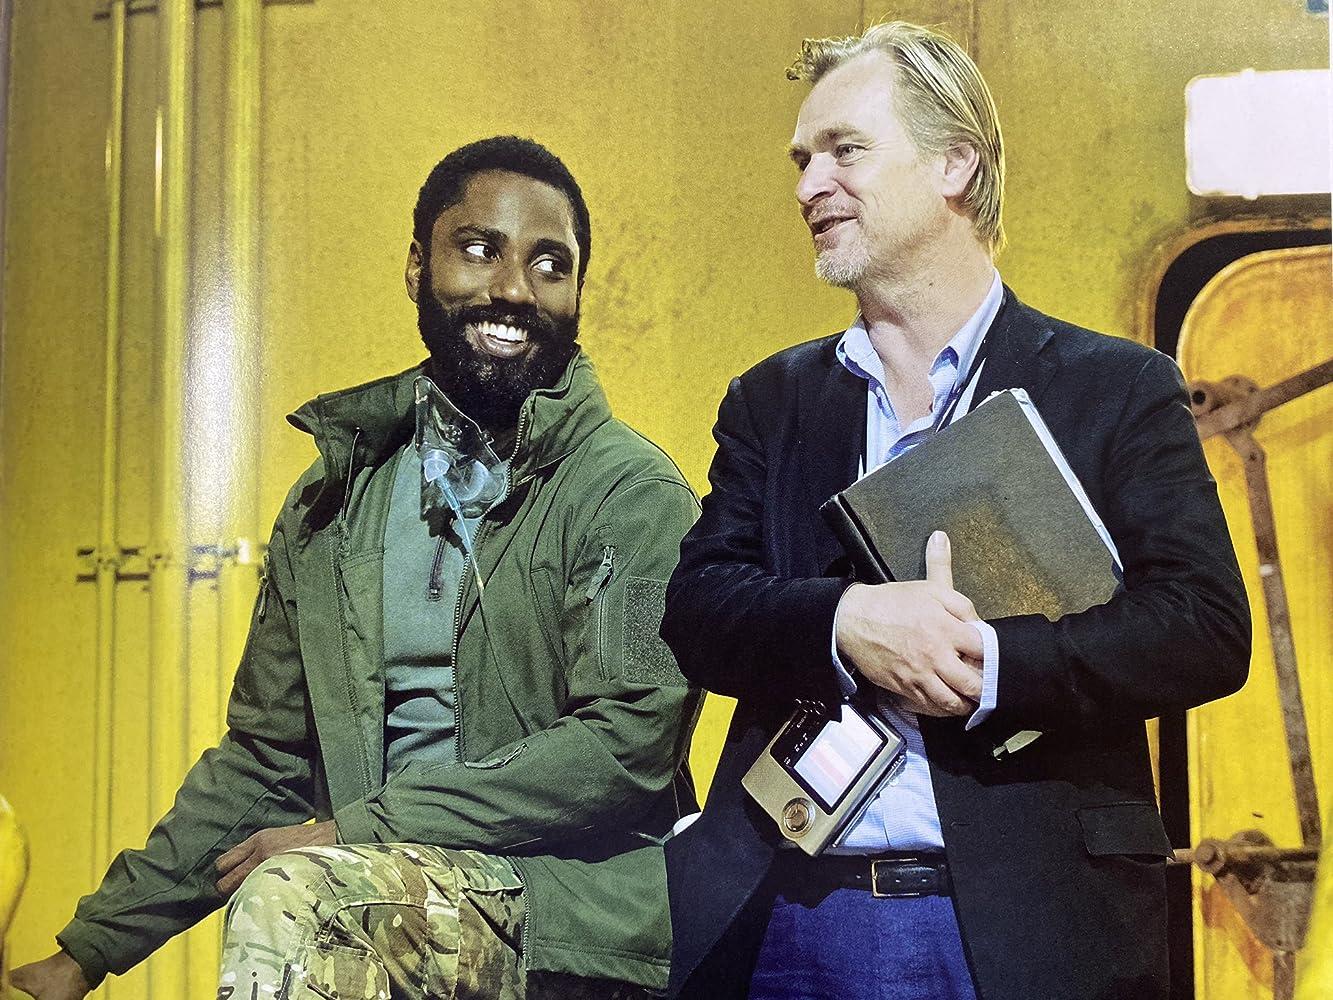 Christopher Nolan and John David Washington in Tenet (2020)